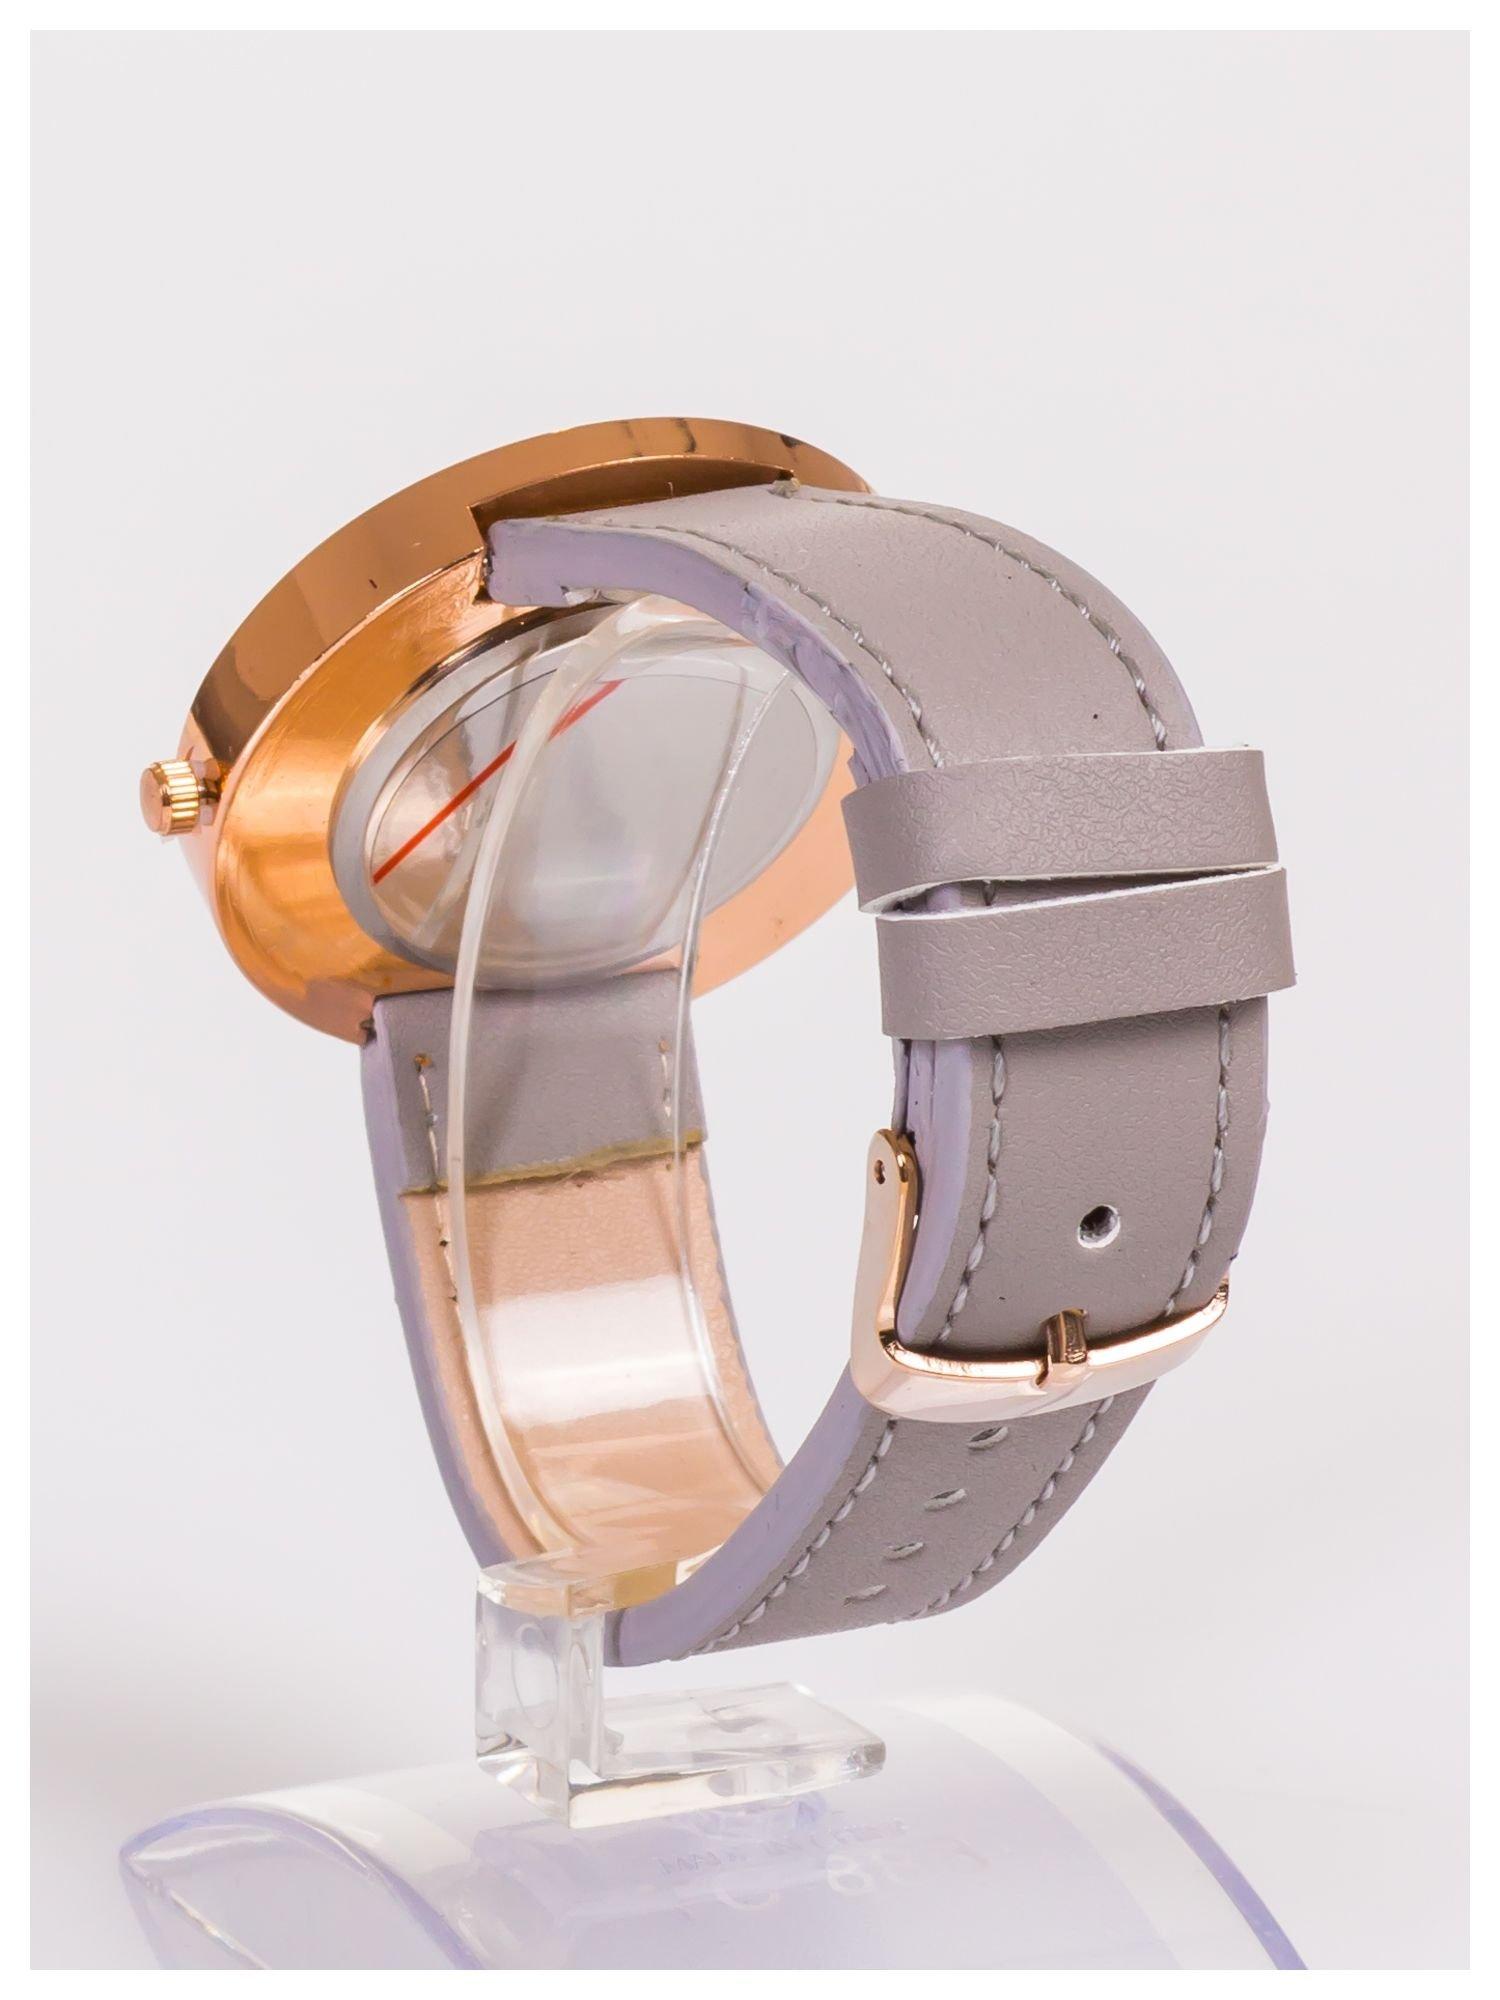 Farril -Klasyka i elegancja szary damski zegarek retro z cyrkoniami -Rose gold                                  zdj.                                  4